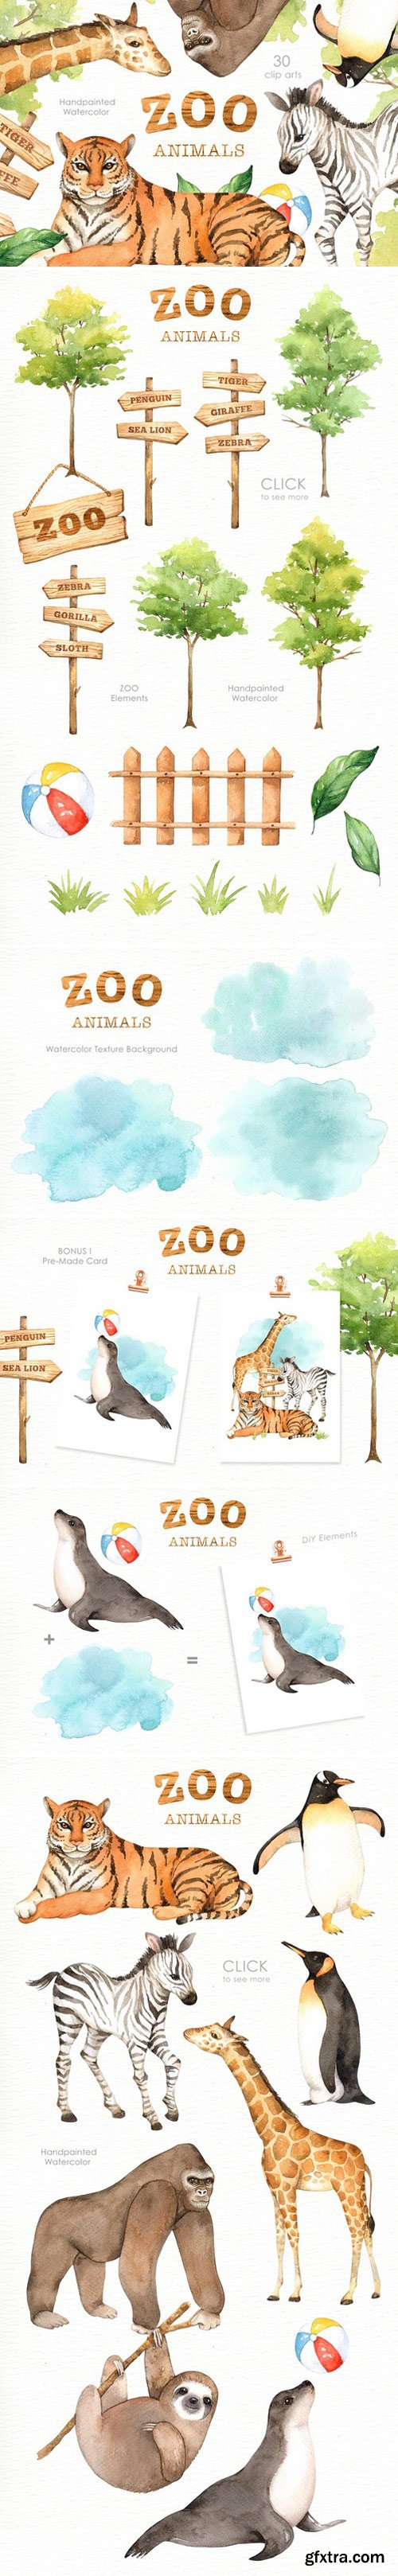 CM - Zoo Animals Watercolor clipart 2401054